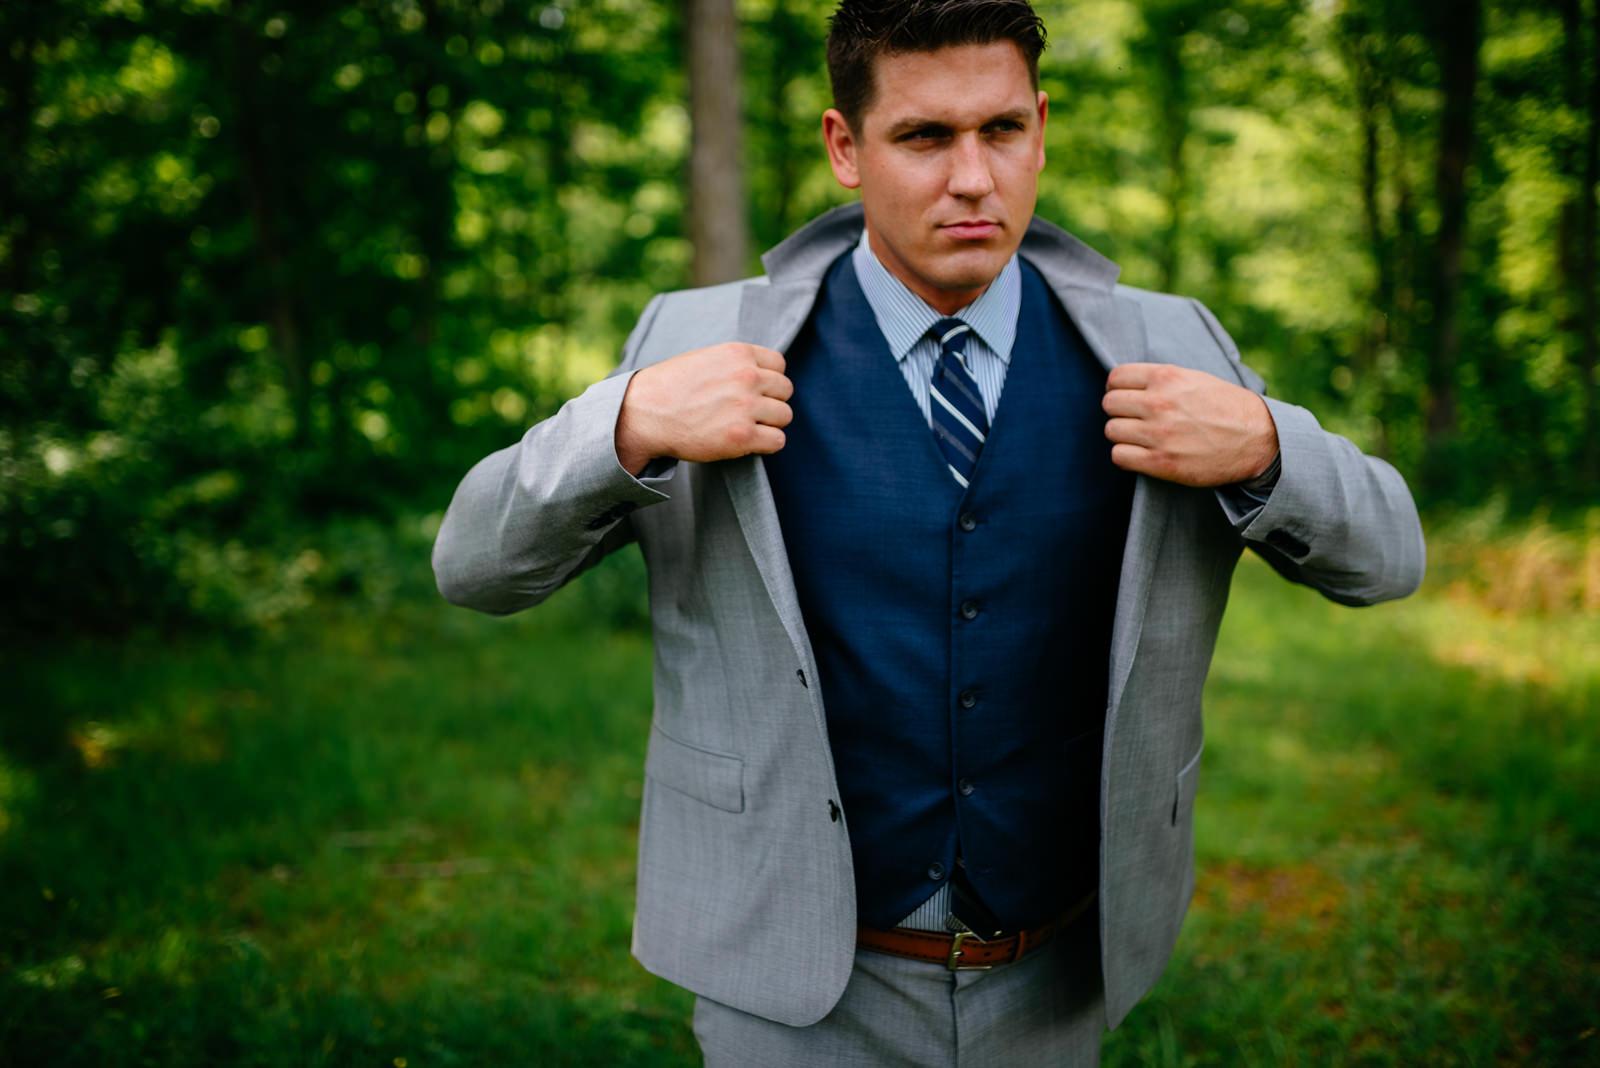 grrom putting on jacket fayetteville wv wedding